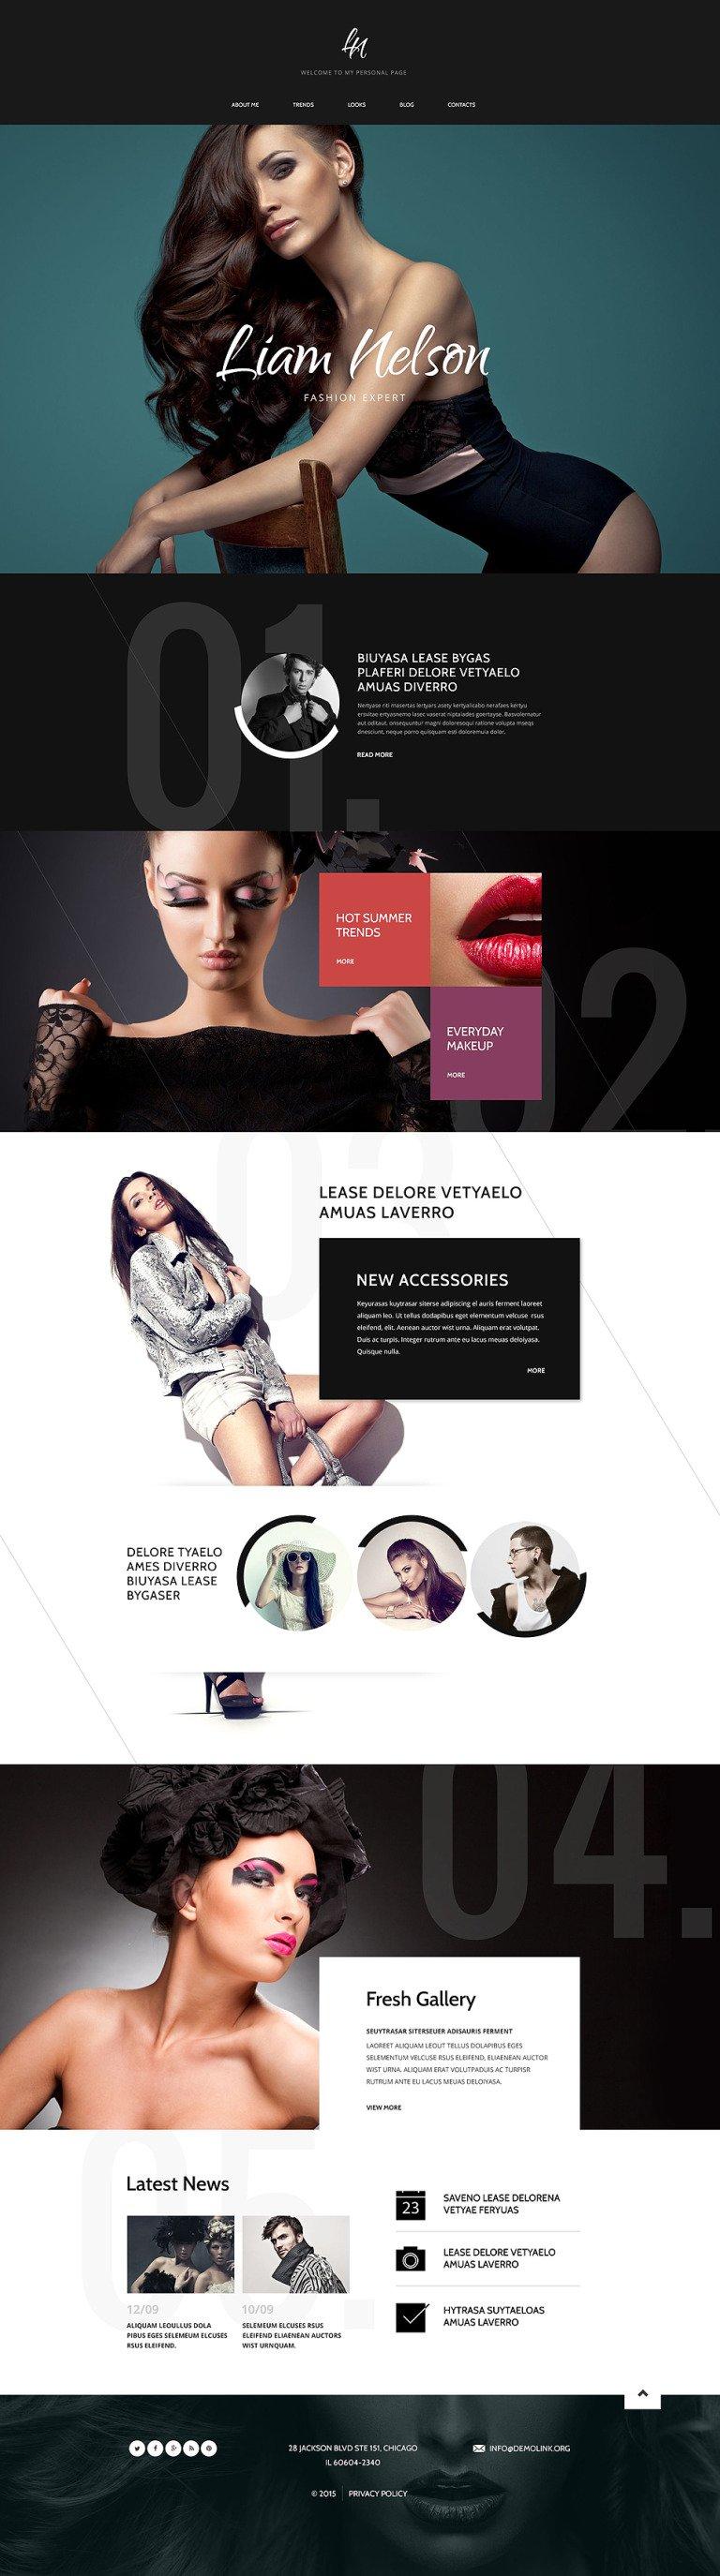 Fashion Expert Drupal Template New Screenshots BIG